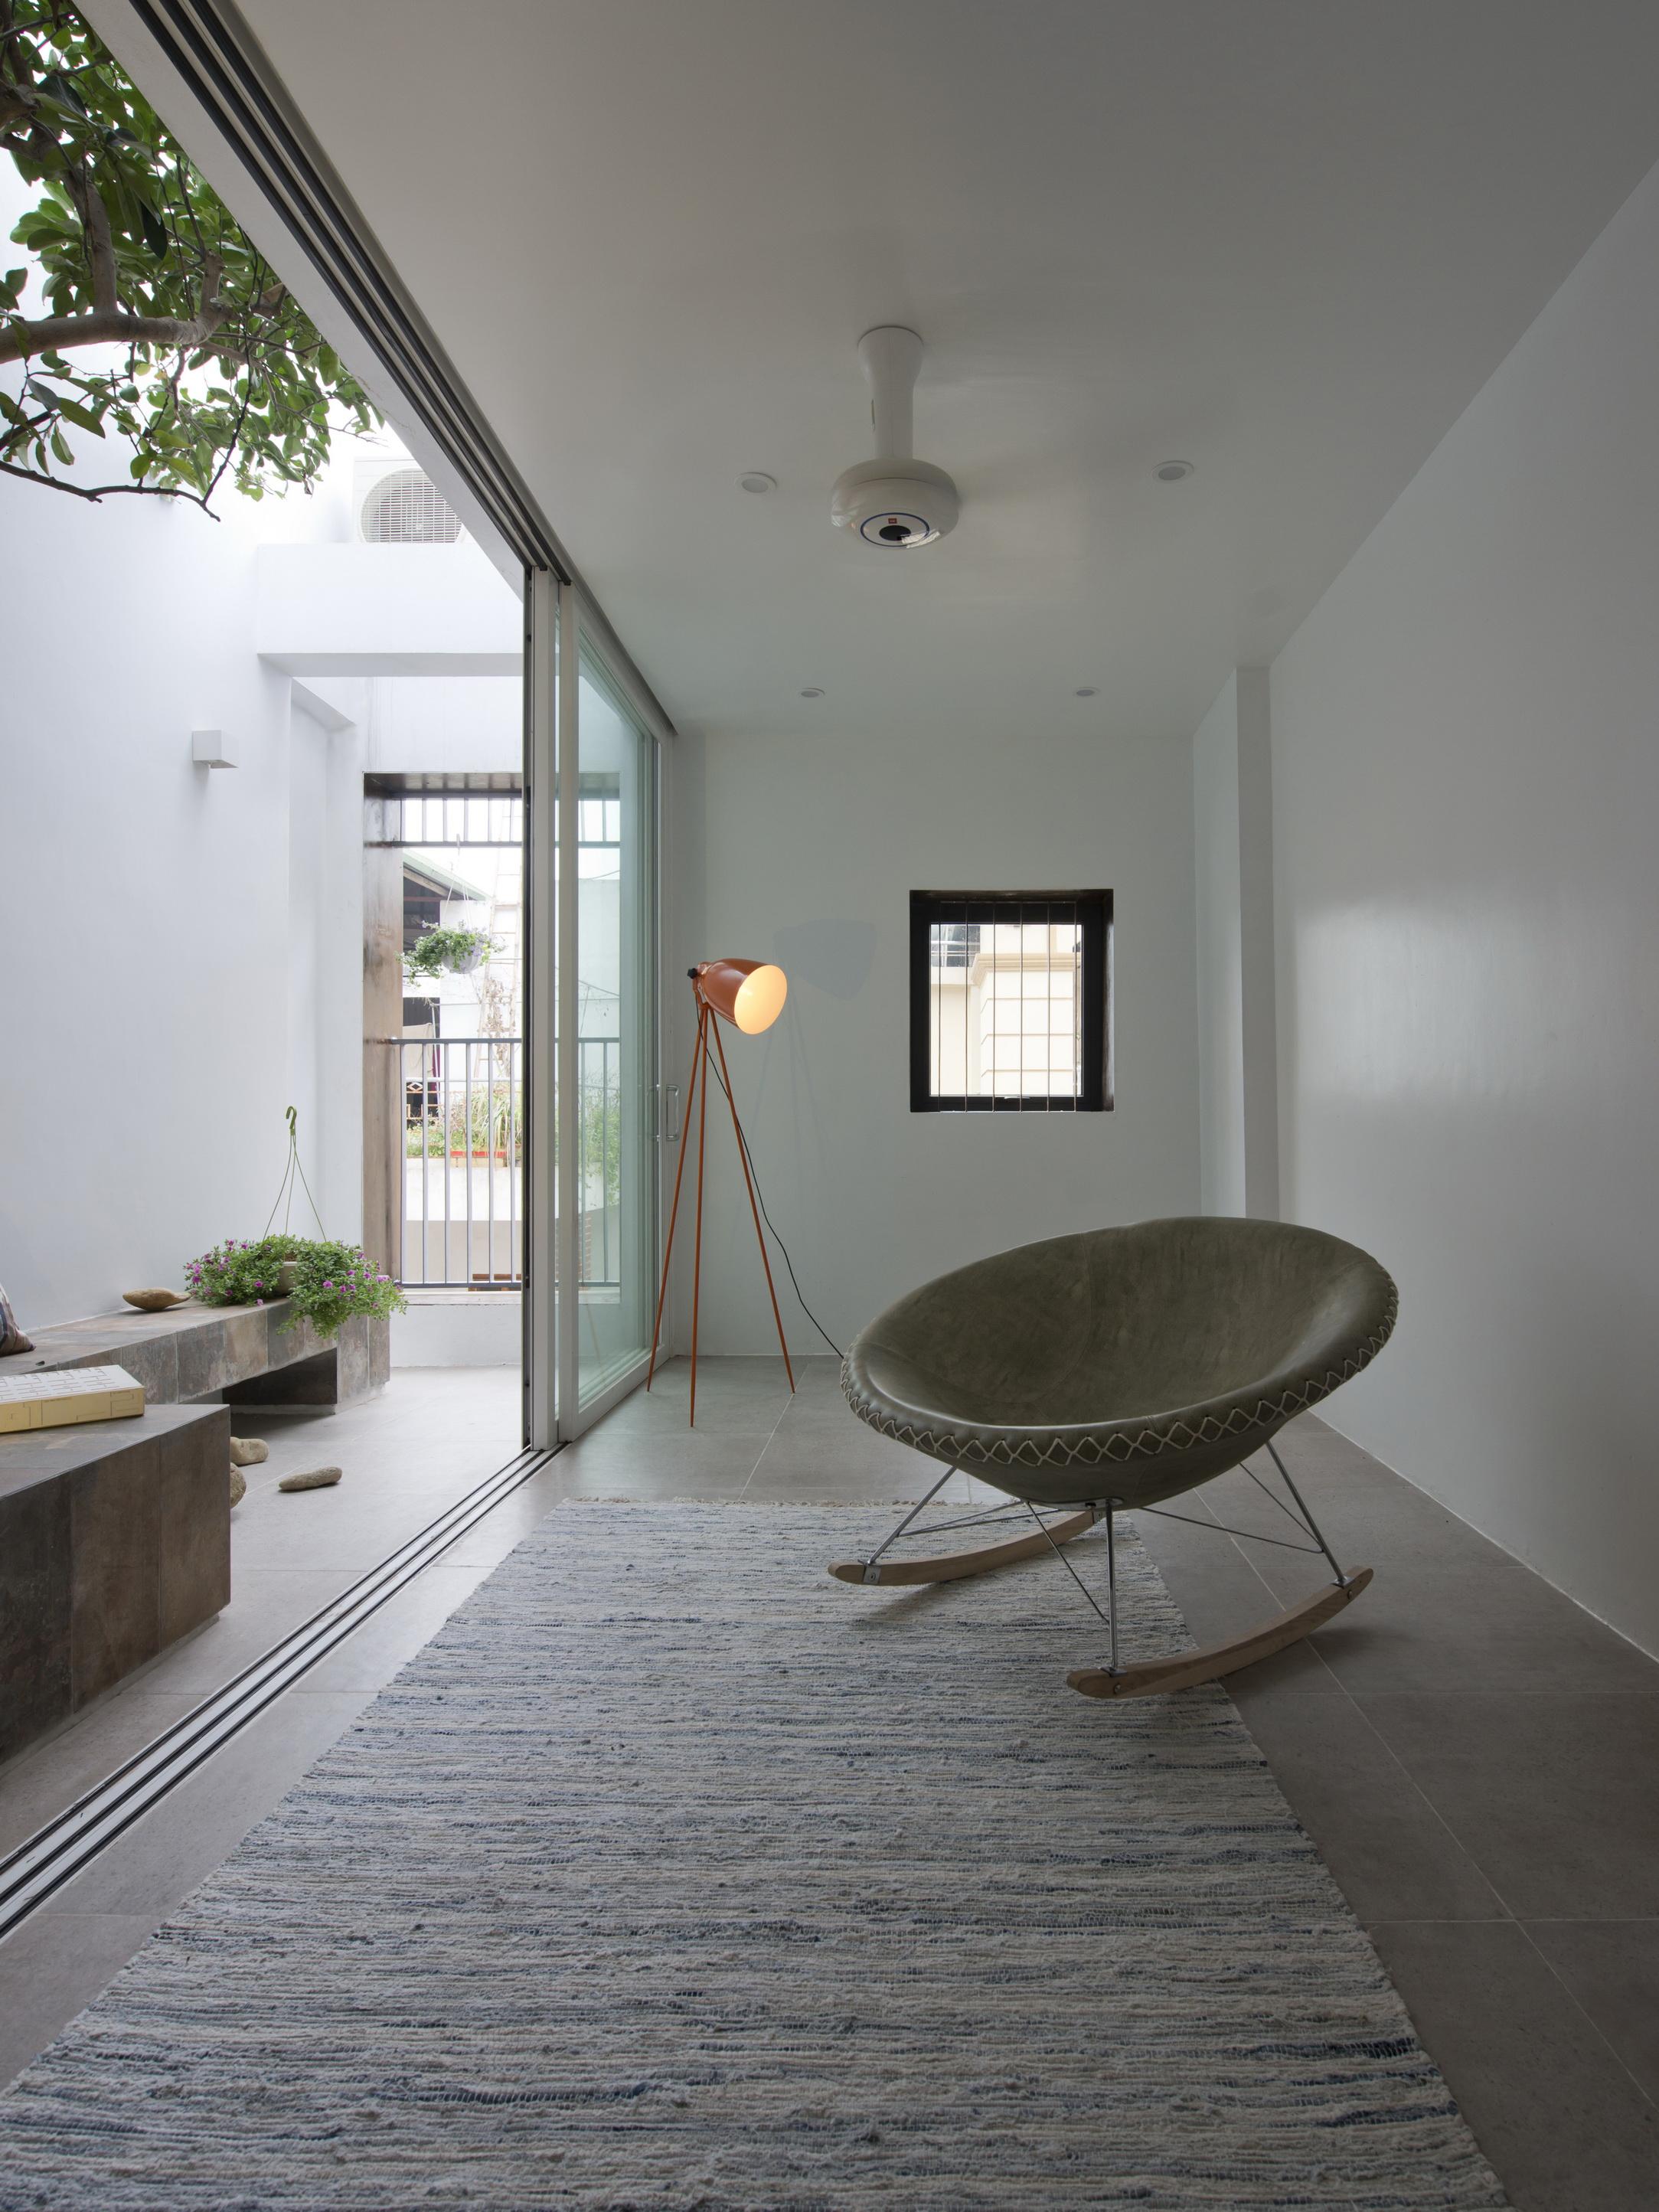 QT House in Hanoi, Vietnam by Landmak Architecture